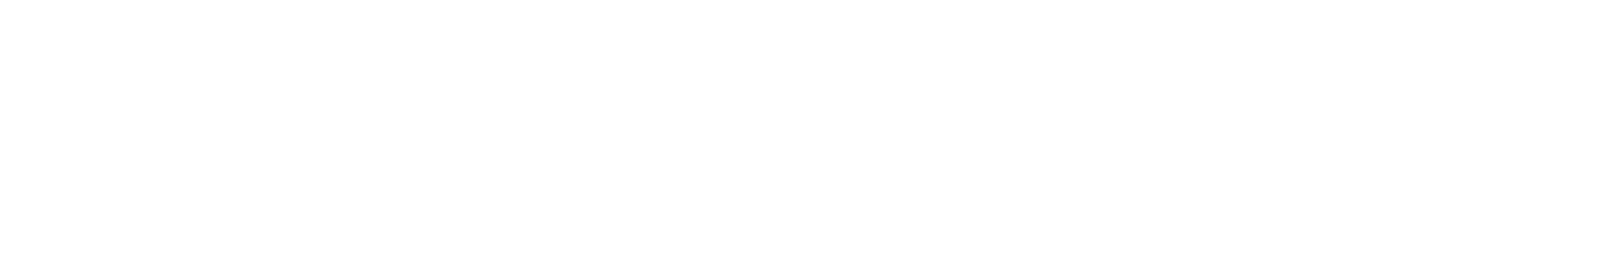 Mazars Forum 2019